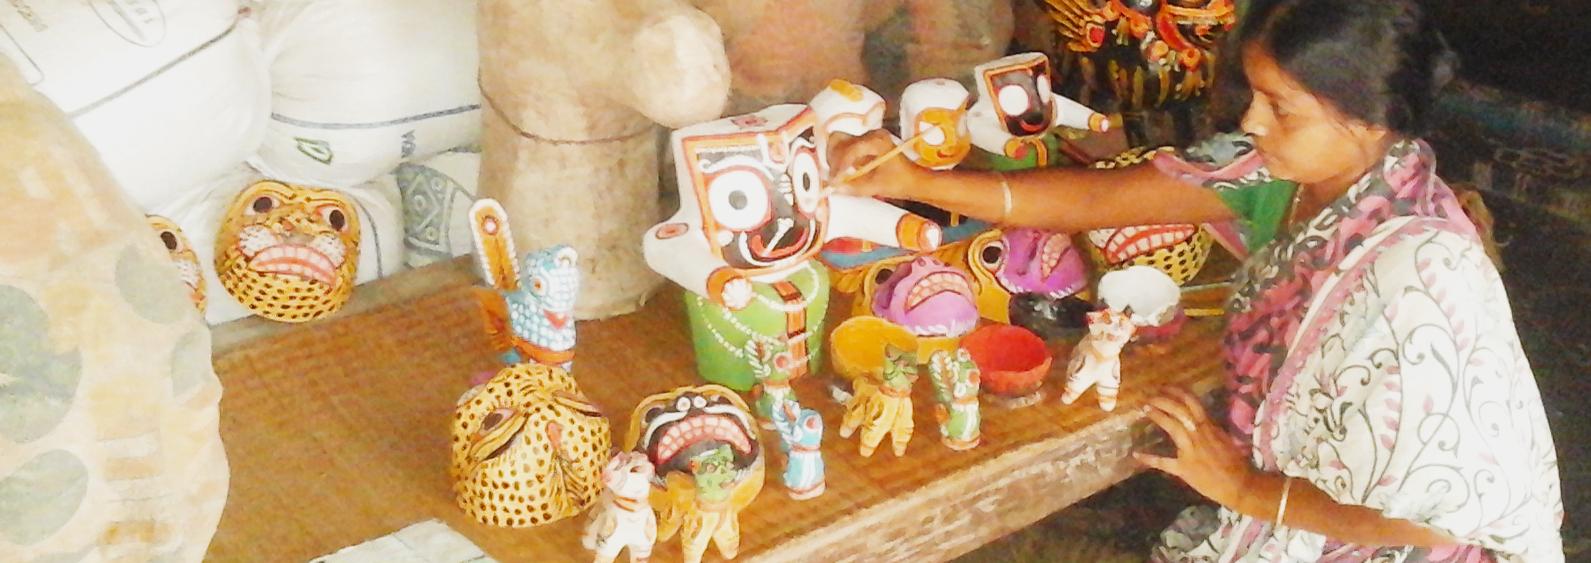 gufinance-carousel-img